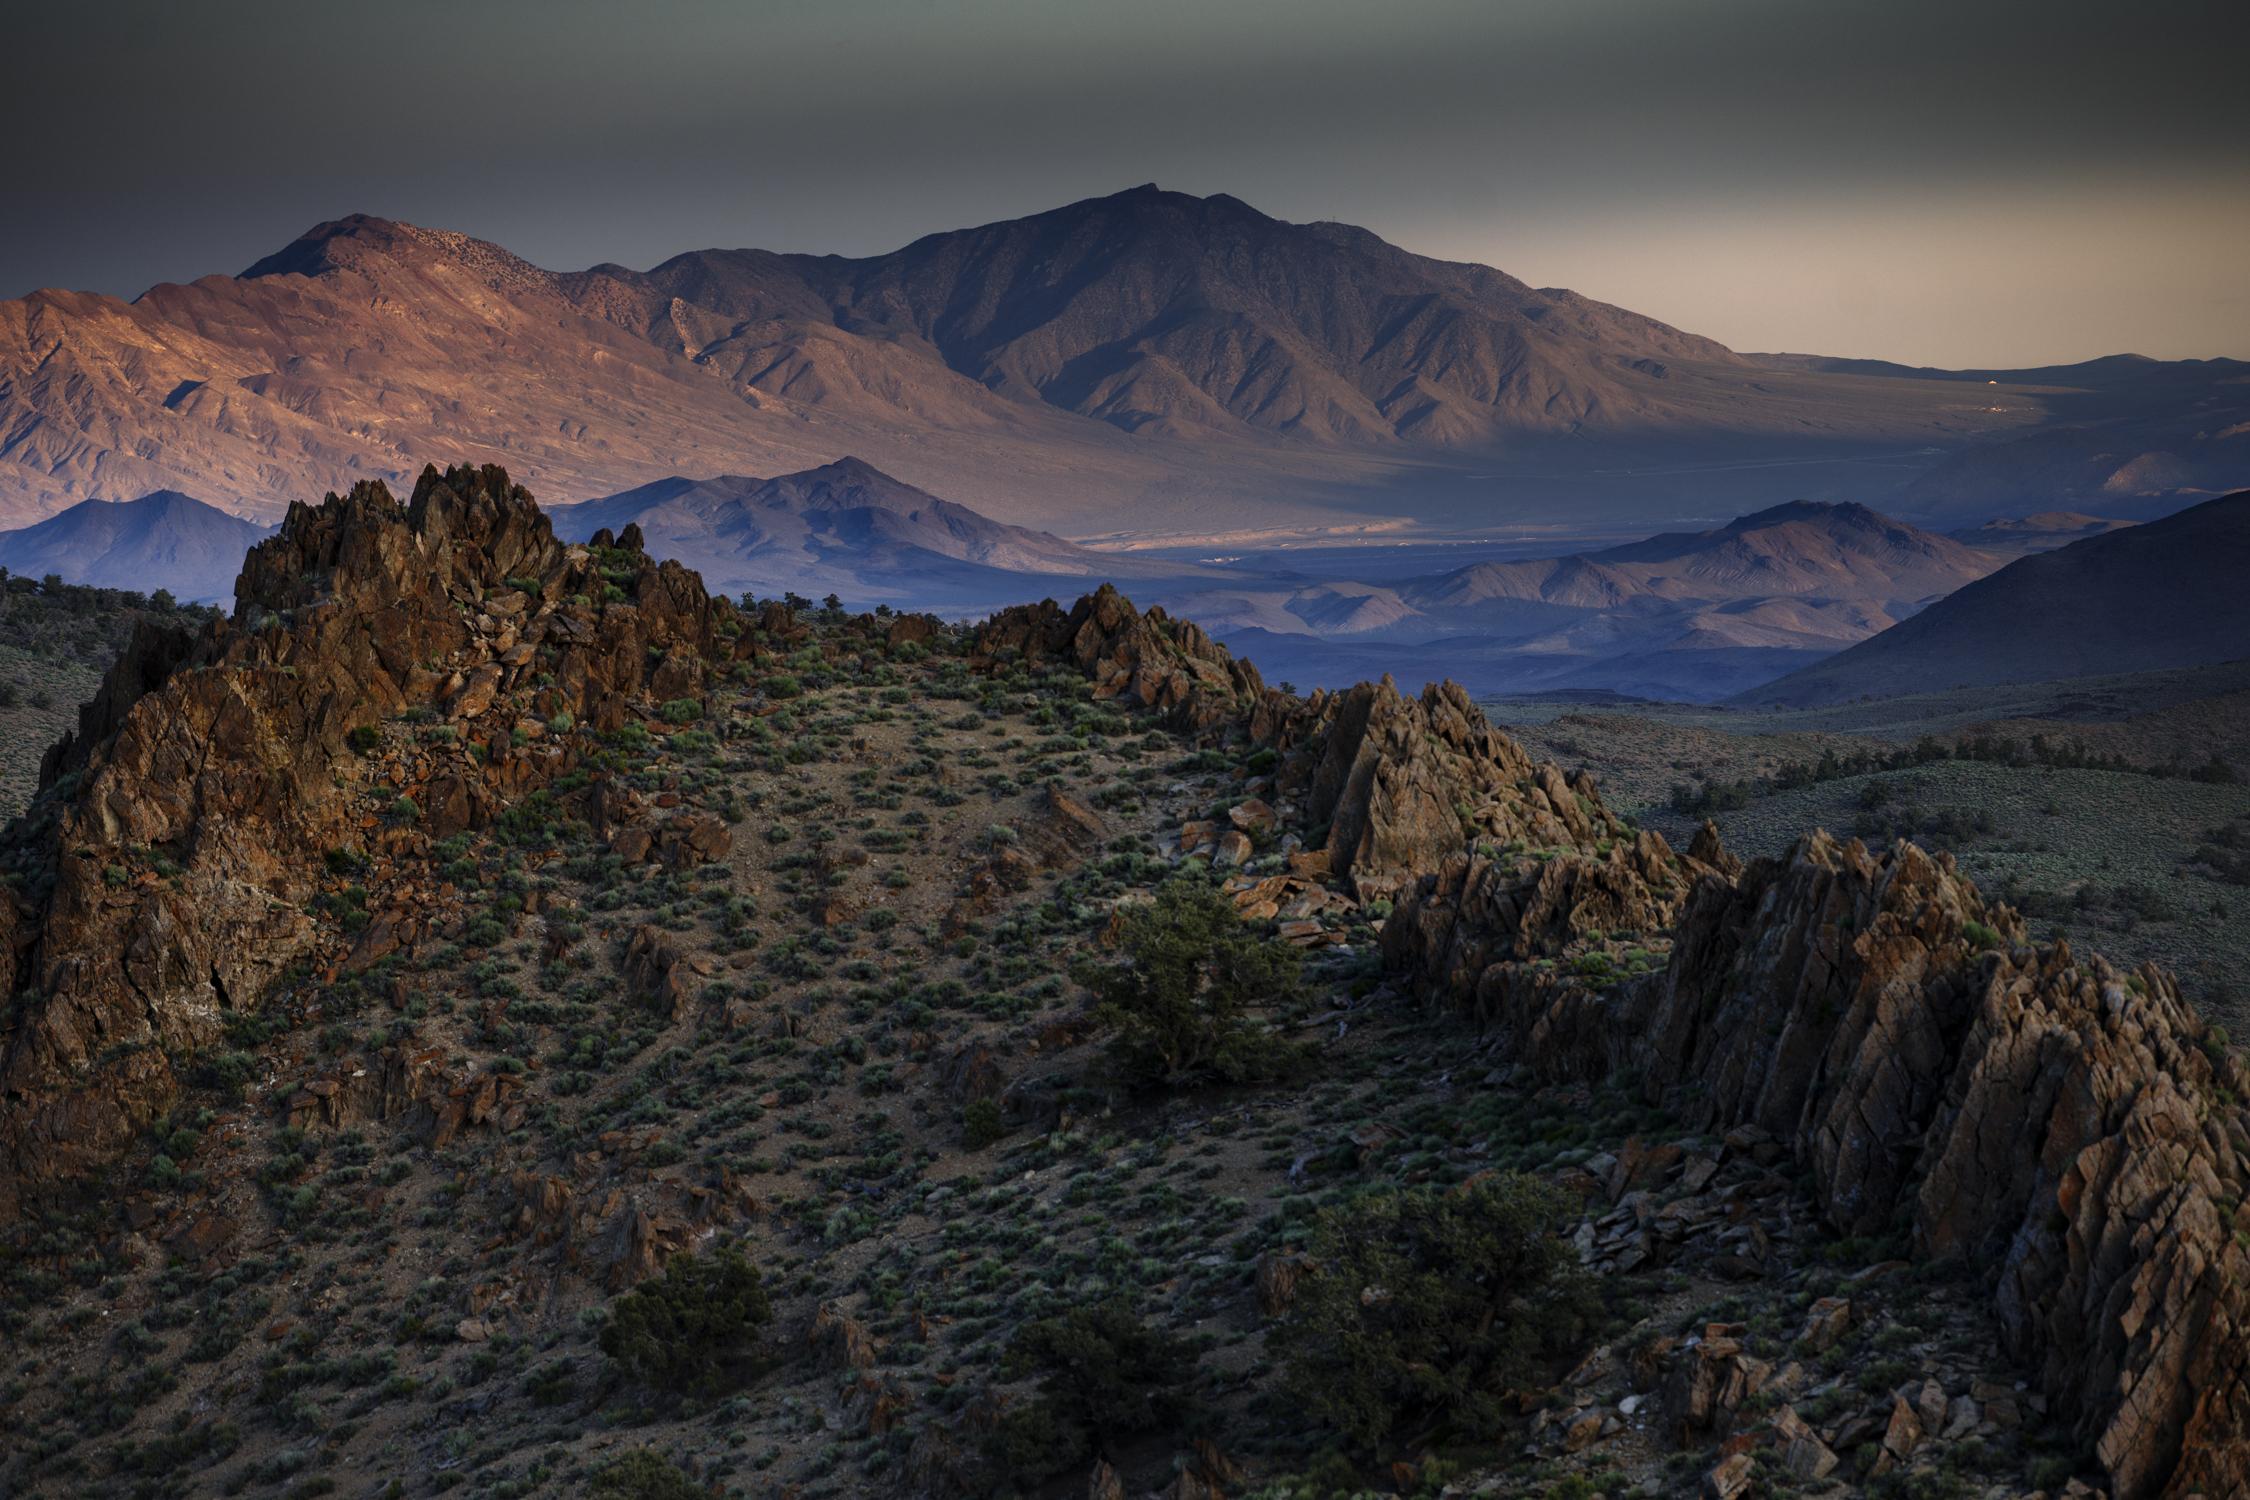 Peak of conglomerate mesa looking towards death valley